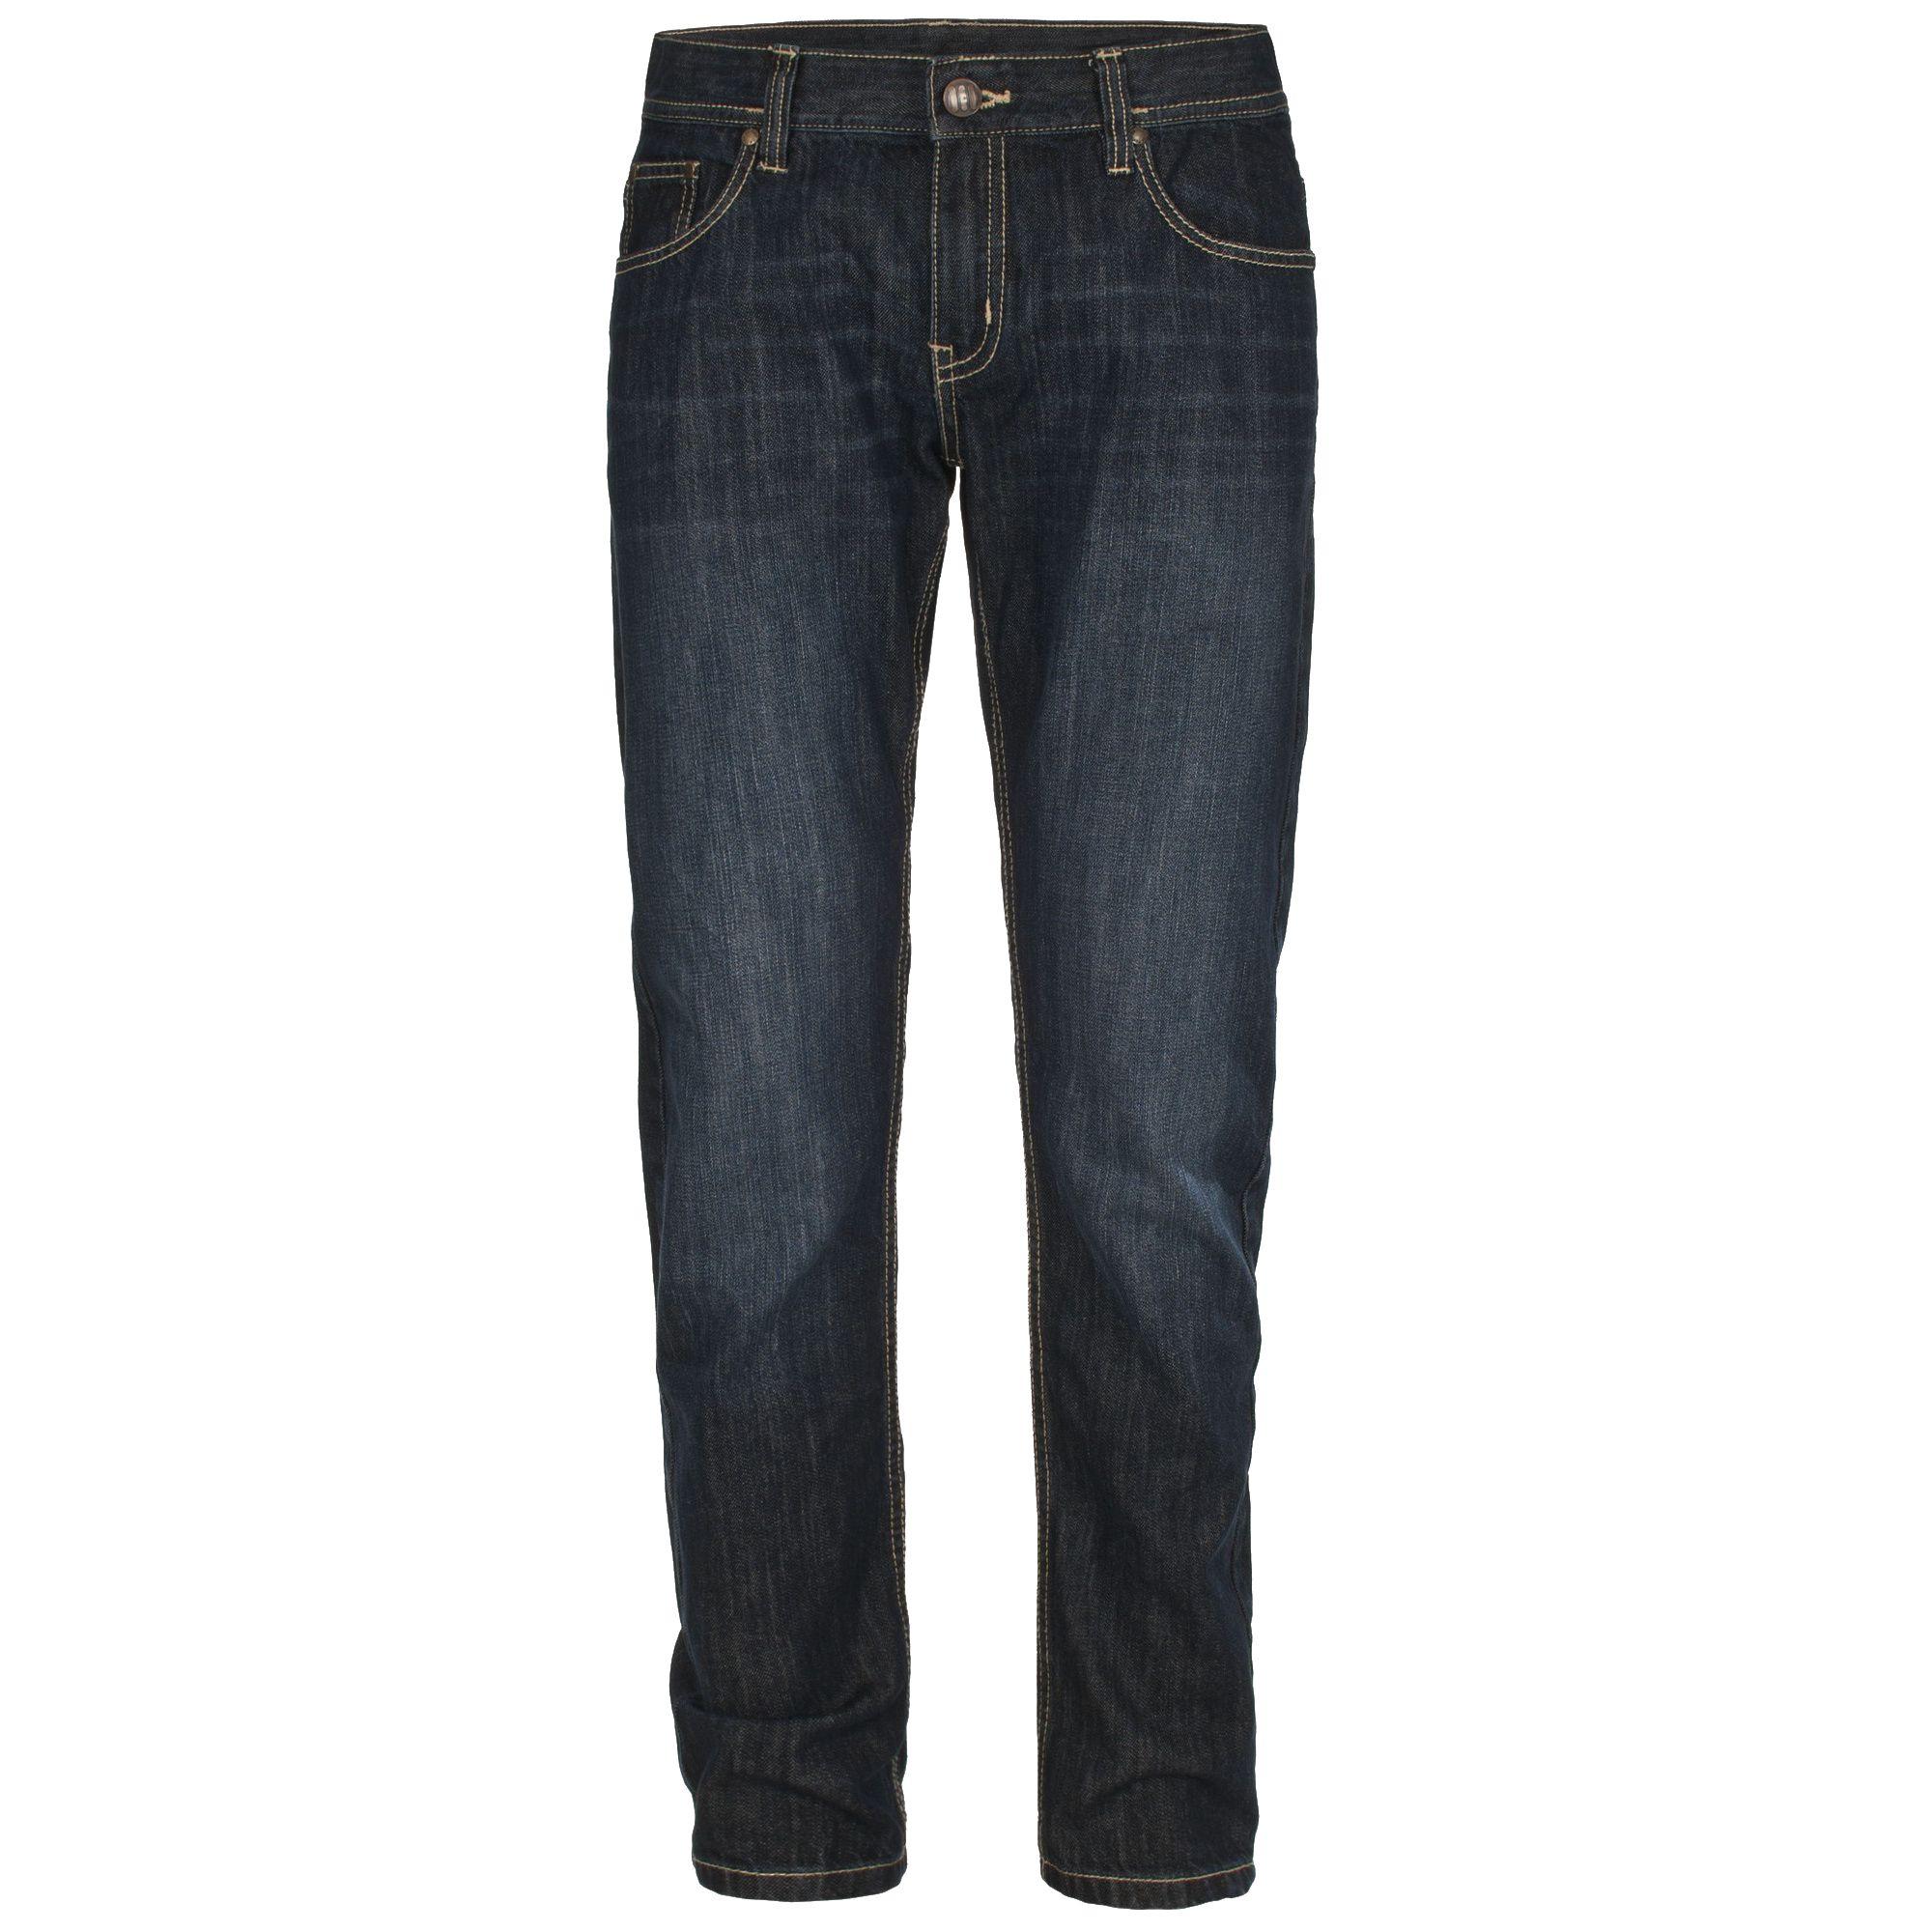 Trespass Womens/Ladies Tulisa Casual Jeans